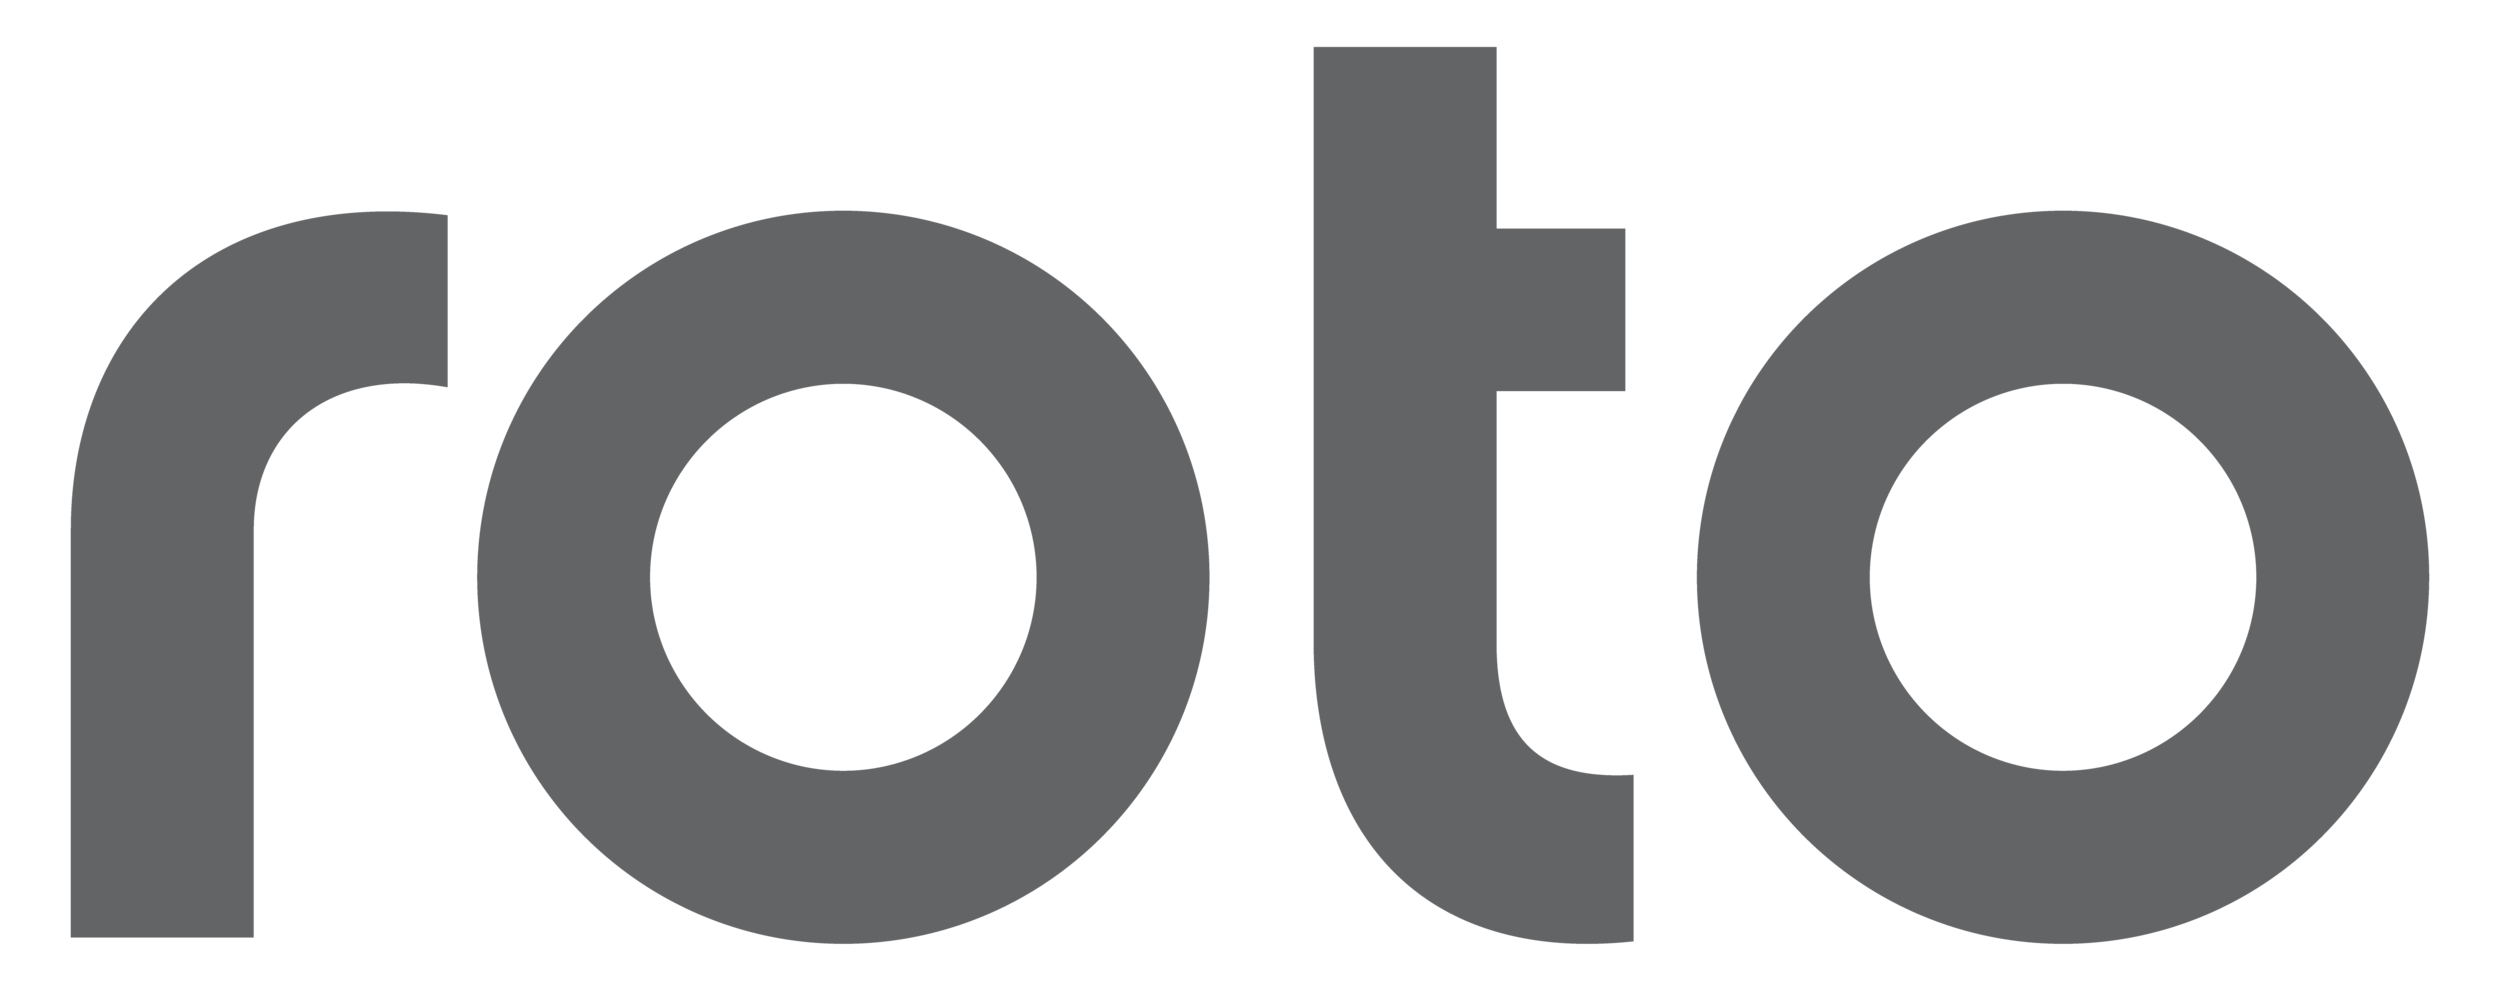 Copy of Roto